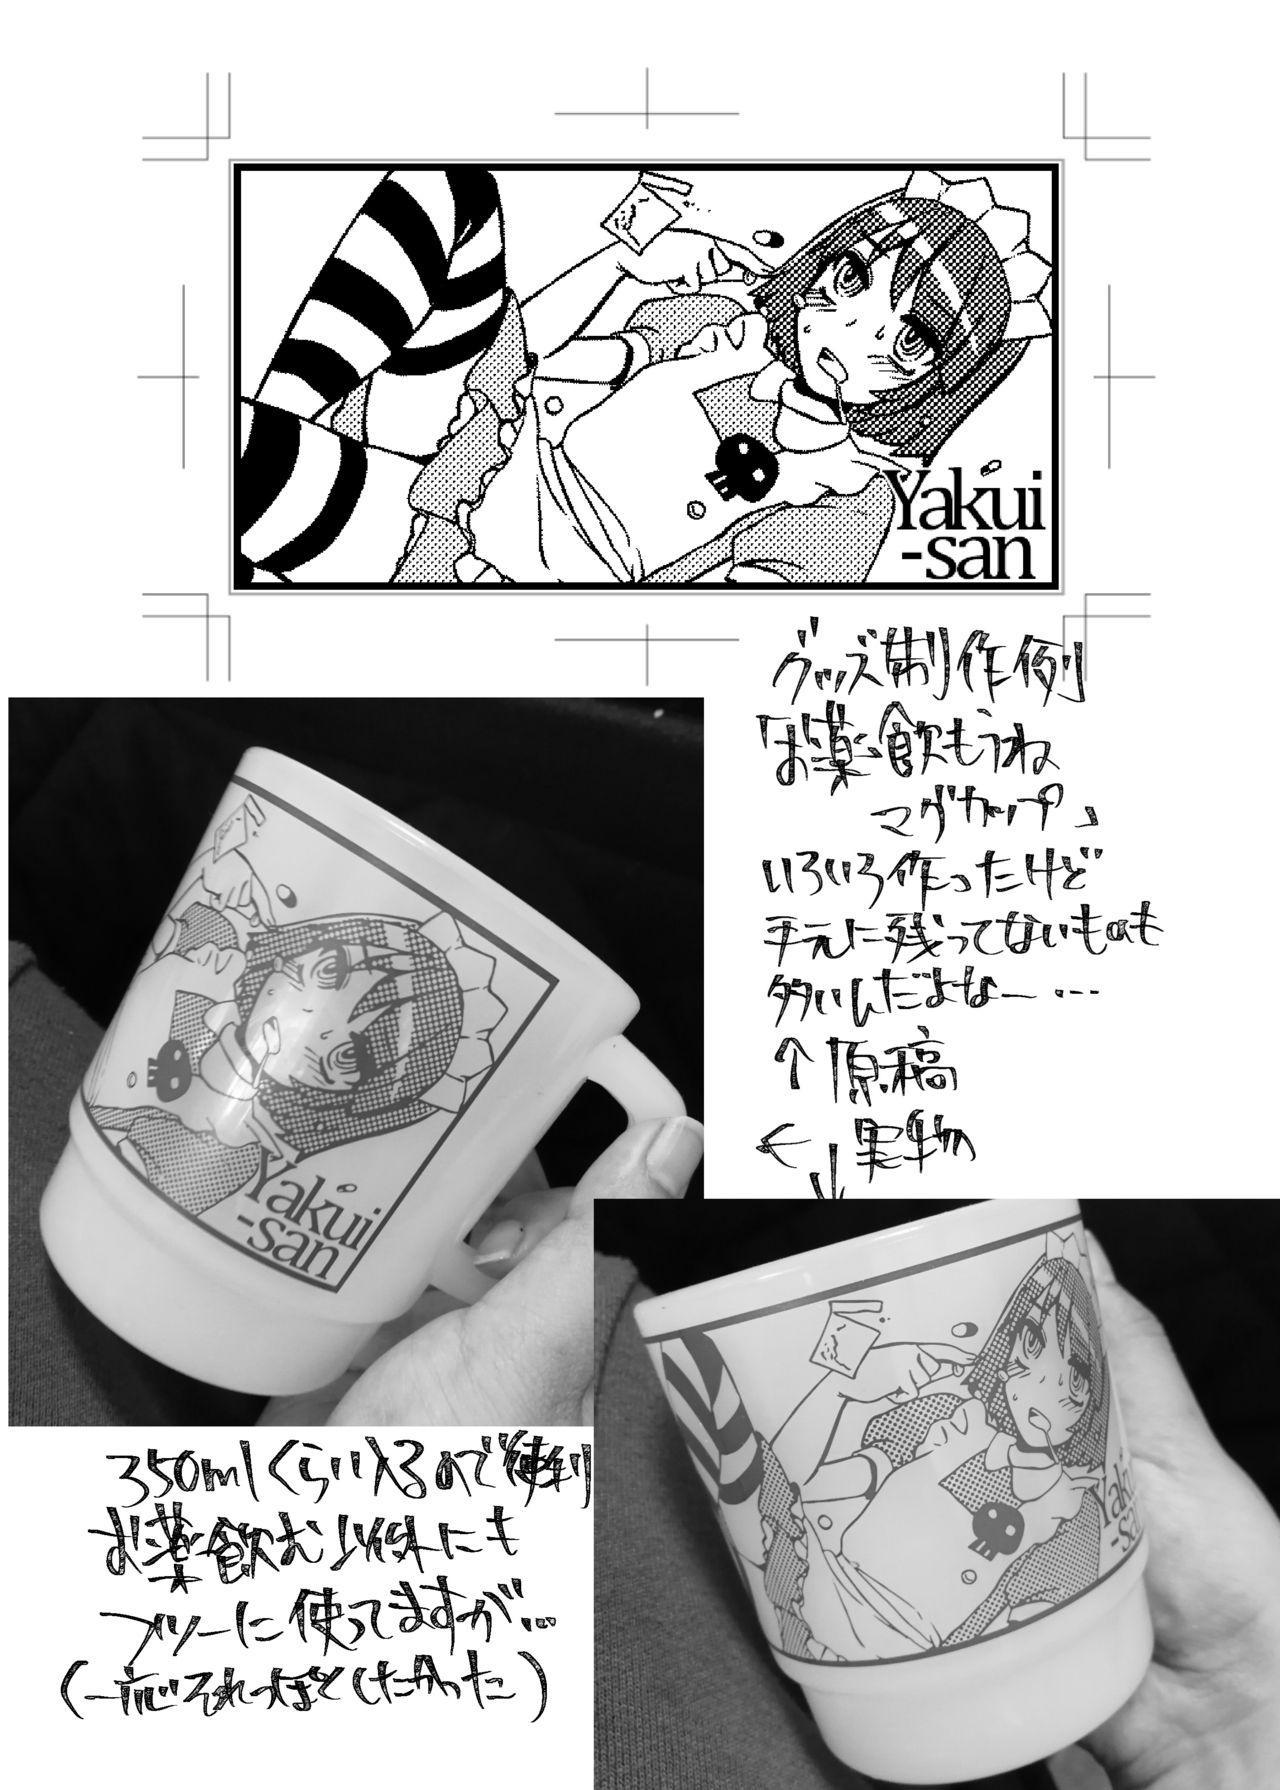 [Sarurururu (Doru Riheko)] Yakui-san Ero  Soushuuhen 2013-2016 (Nijiura Maids) [Digital] 43